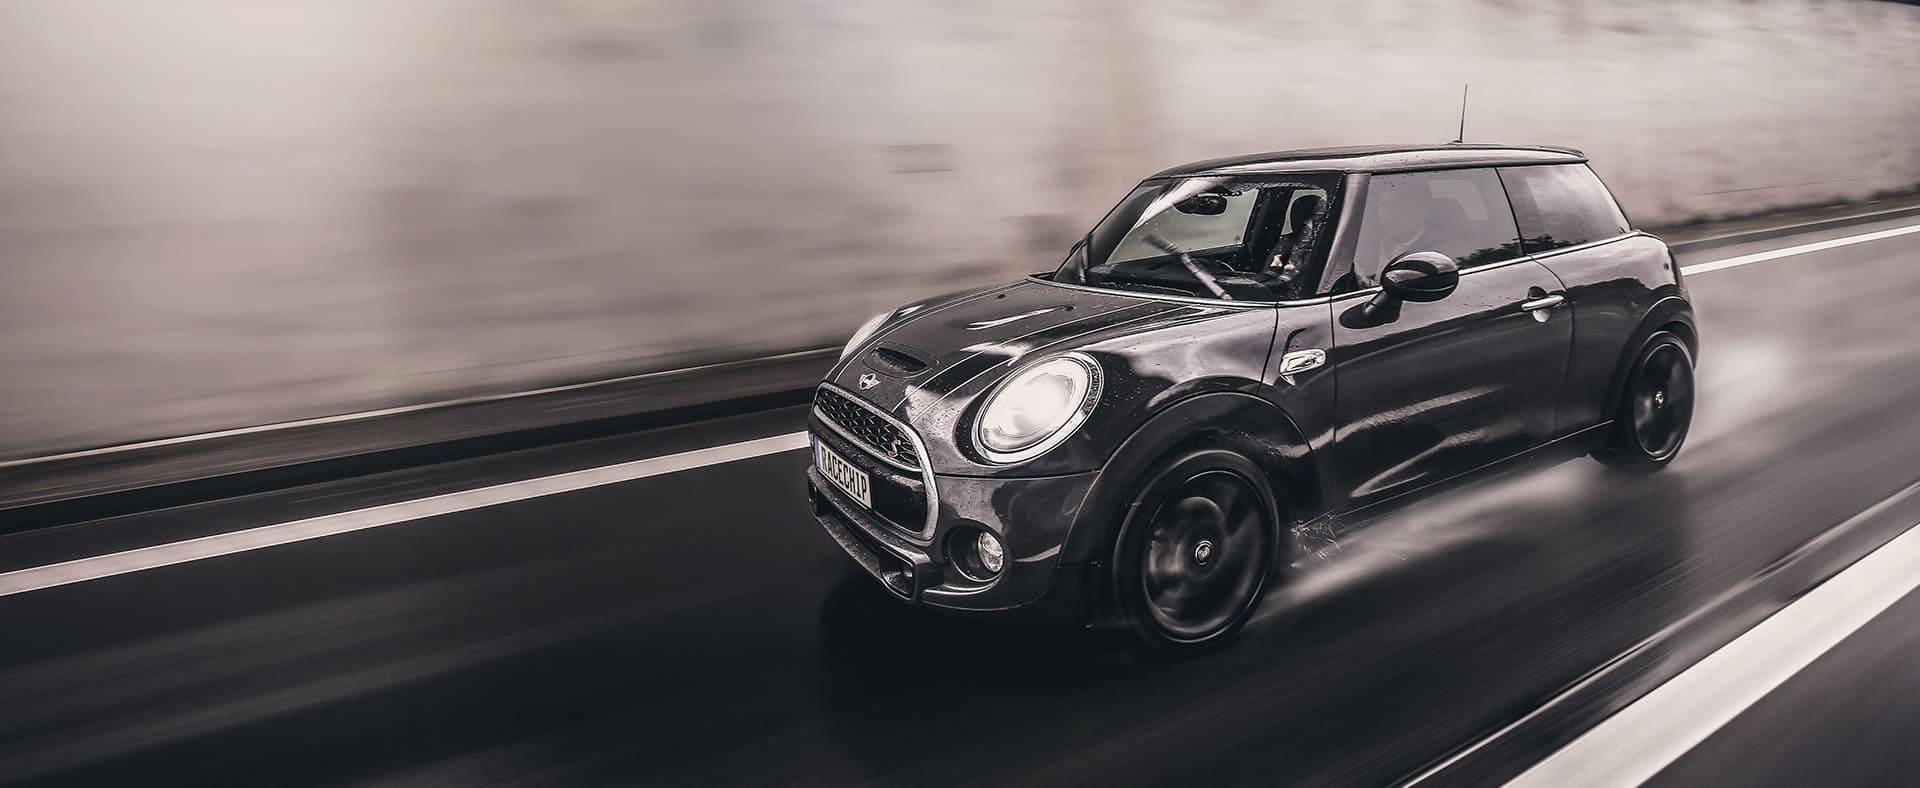 Der Neue Mini Cooper S Chiptuning Mit Racechip